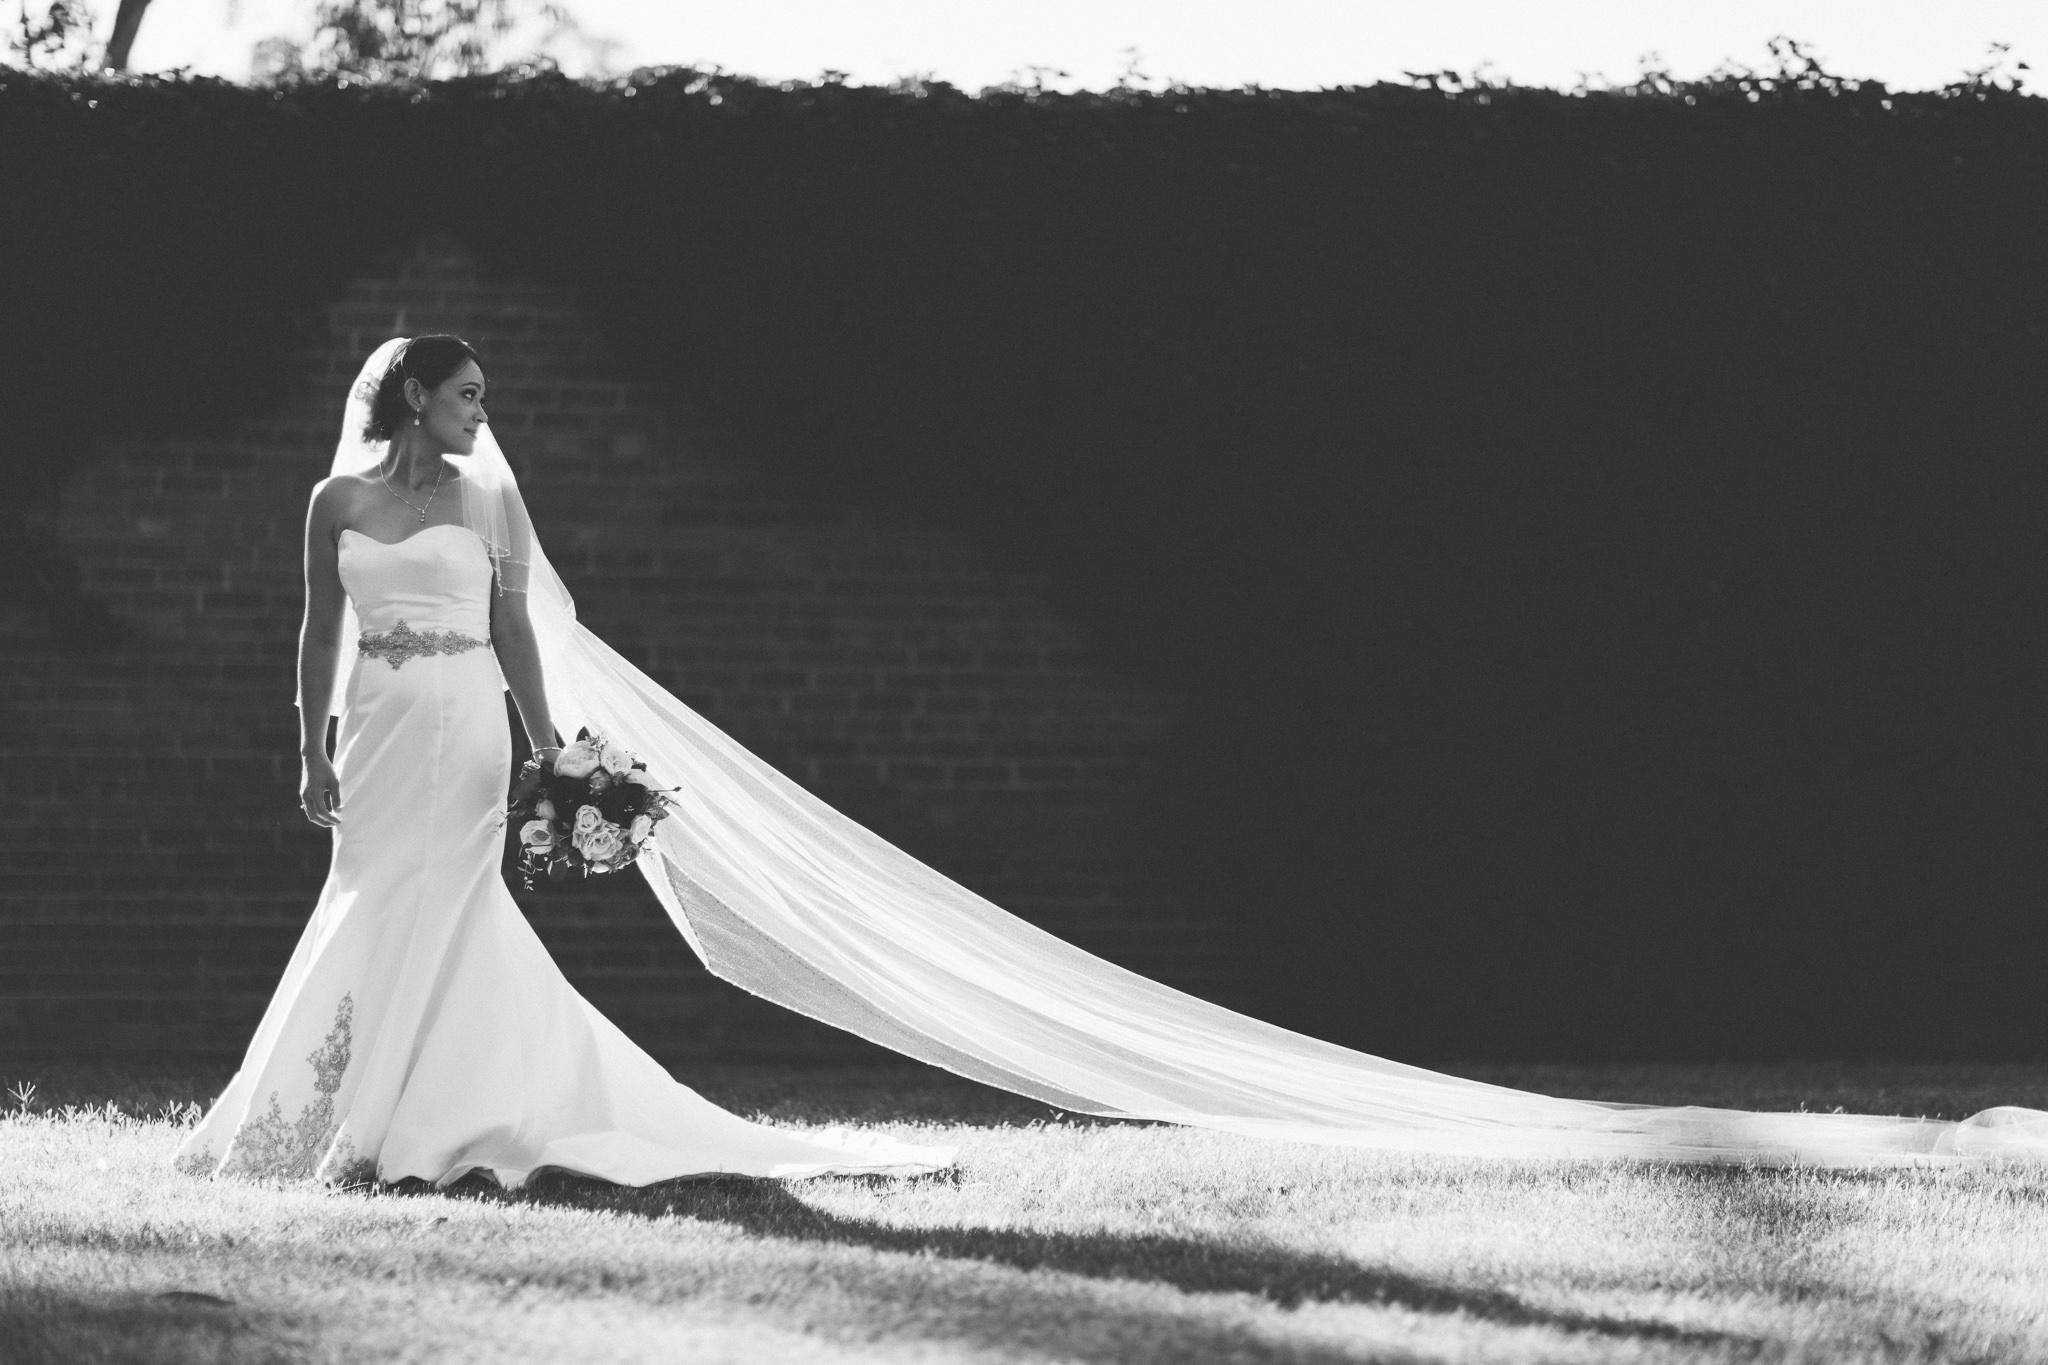 Long veil on bride